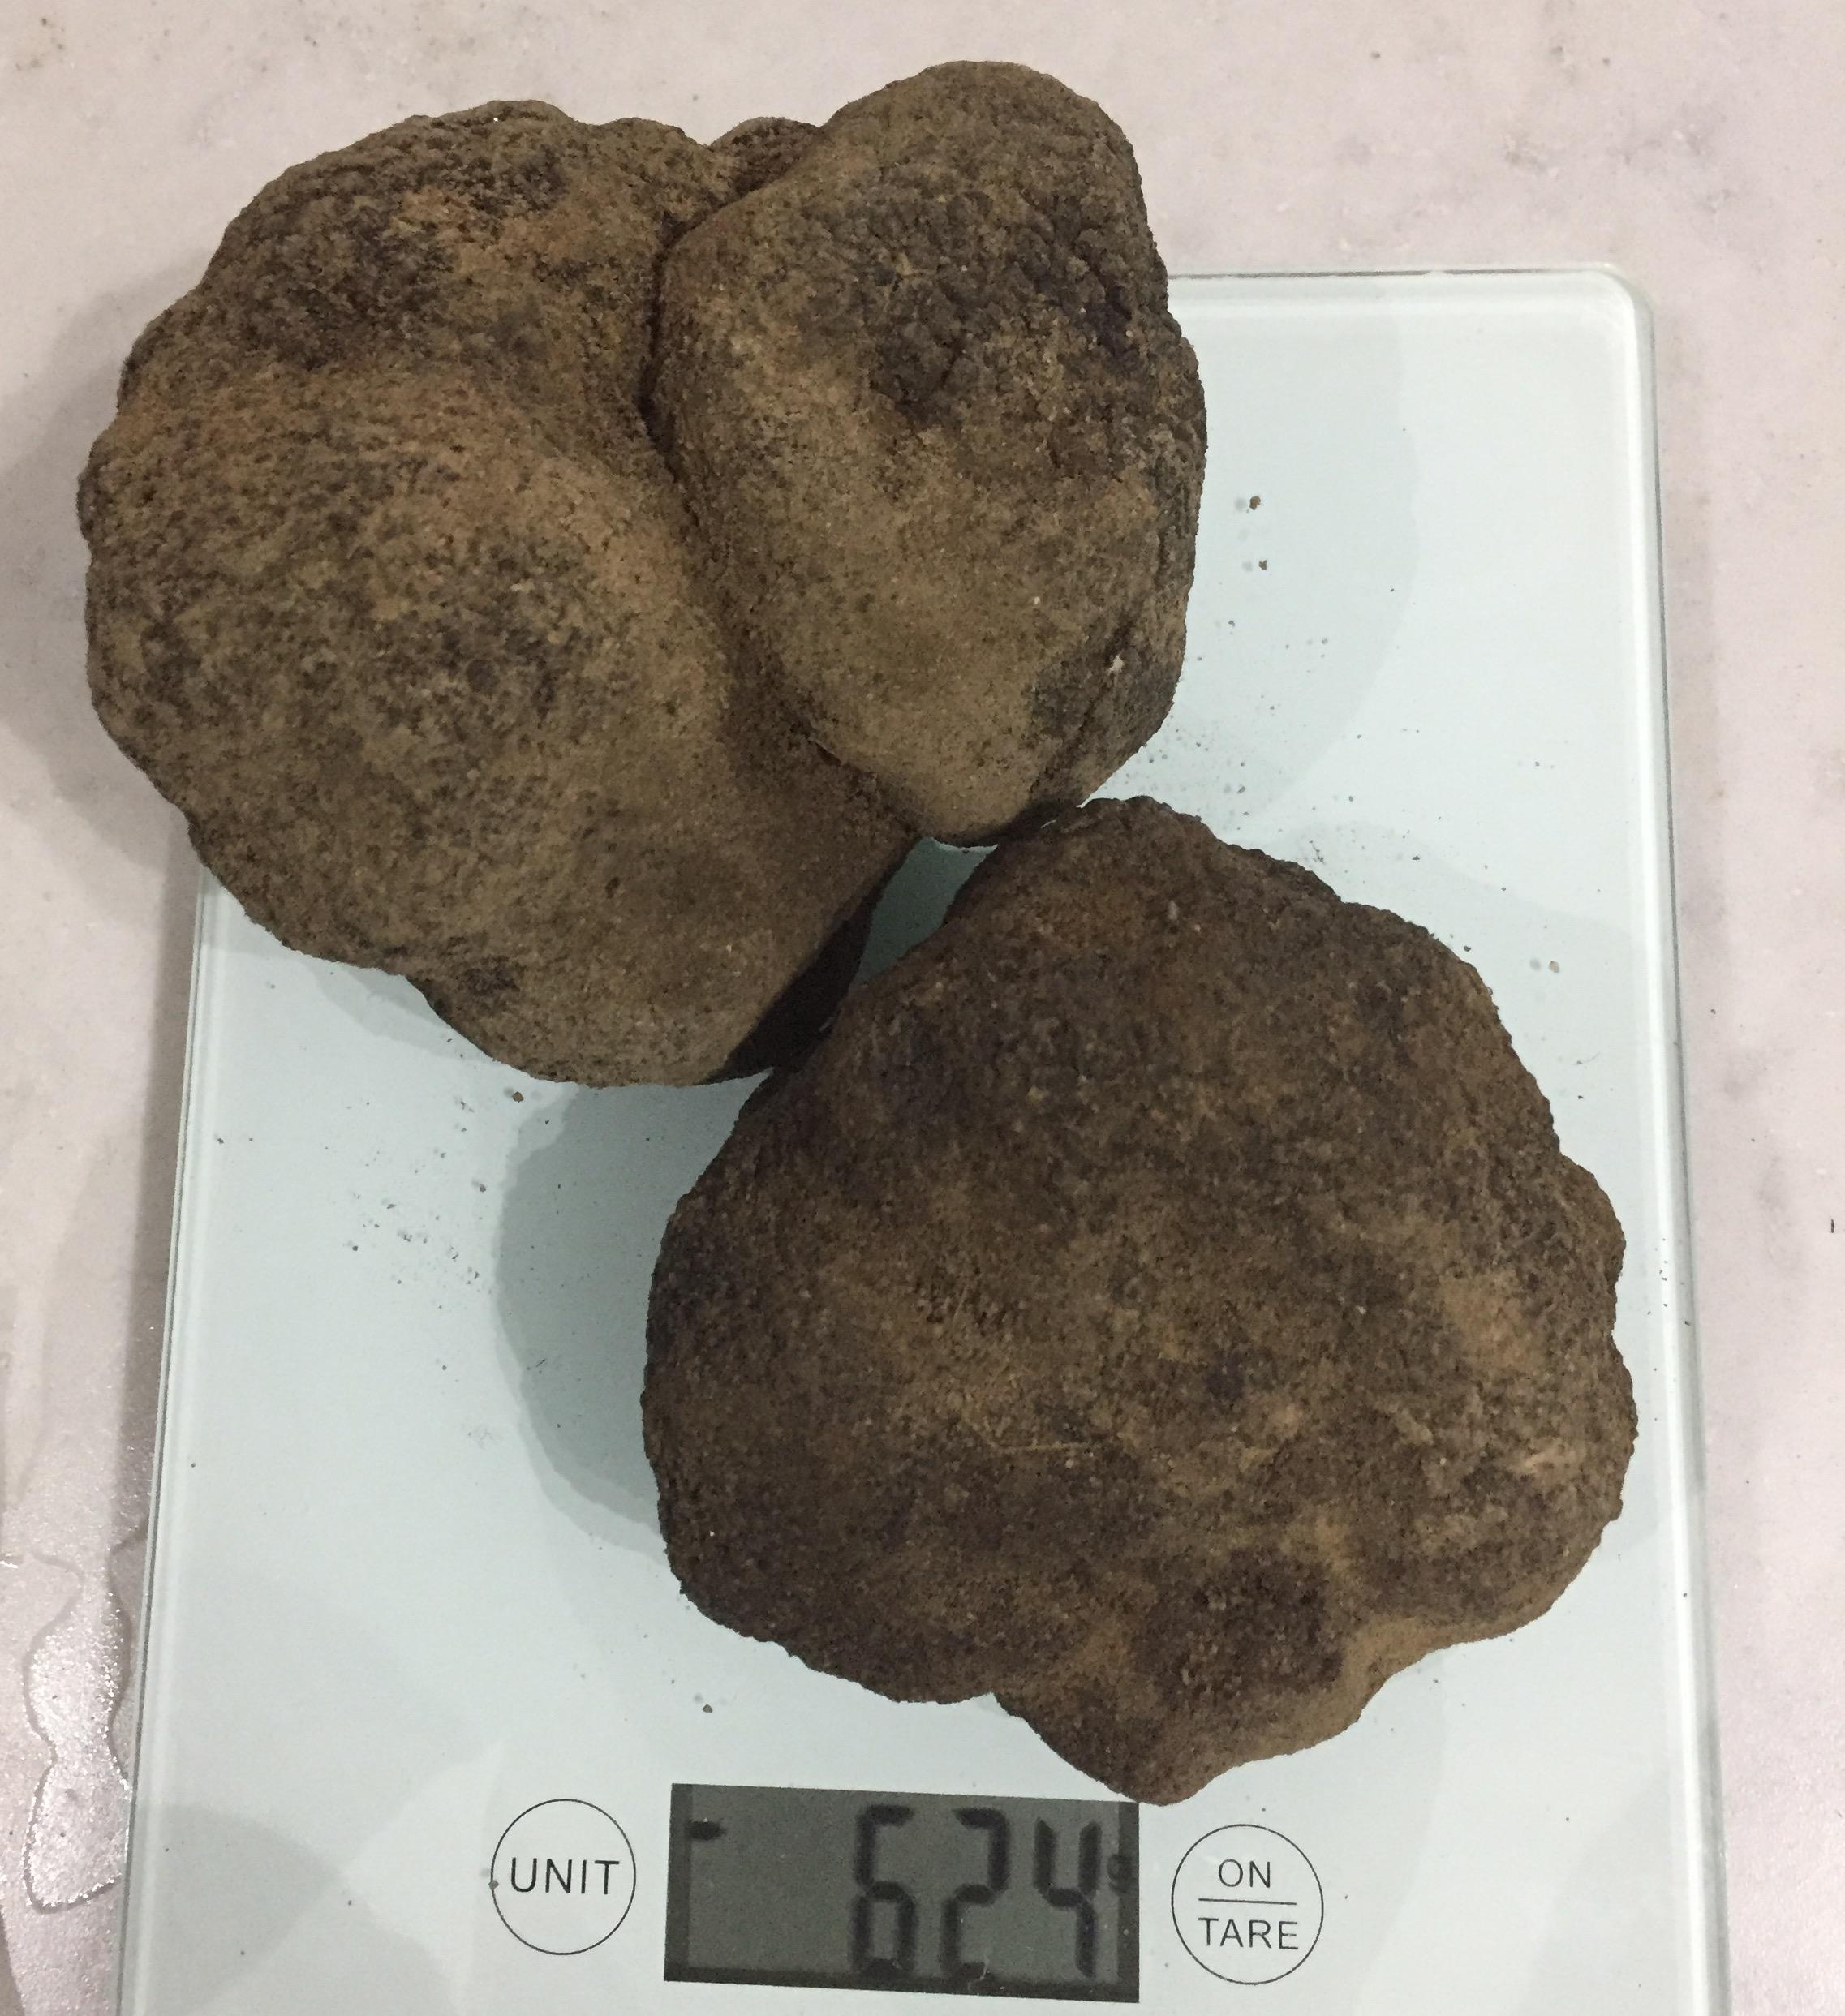 624g truffles